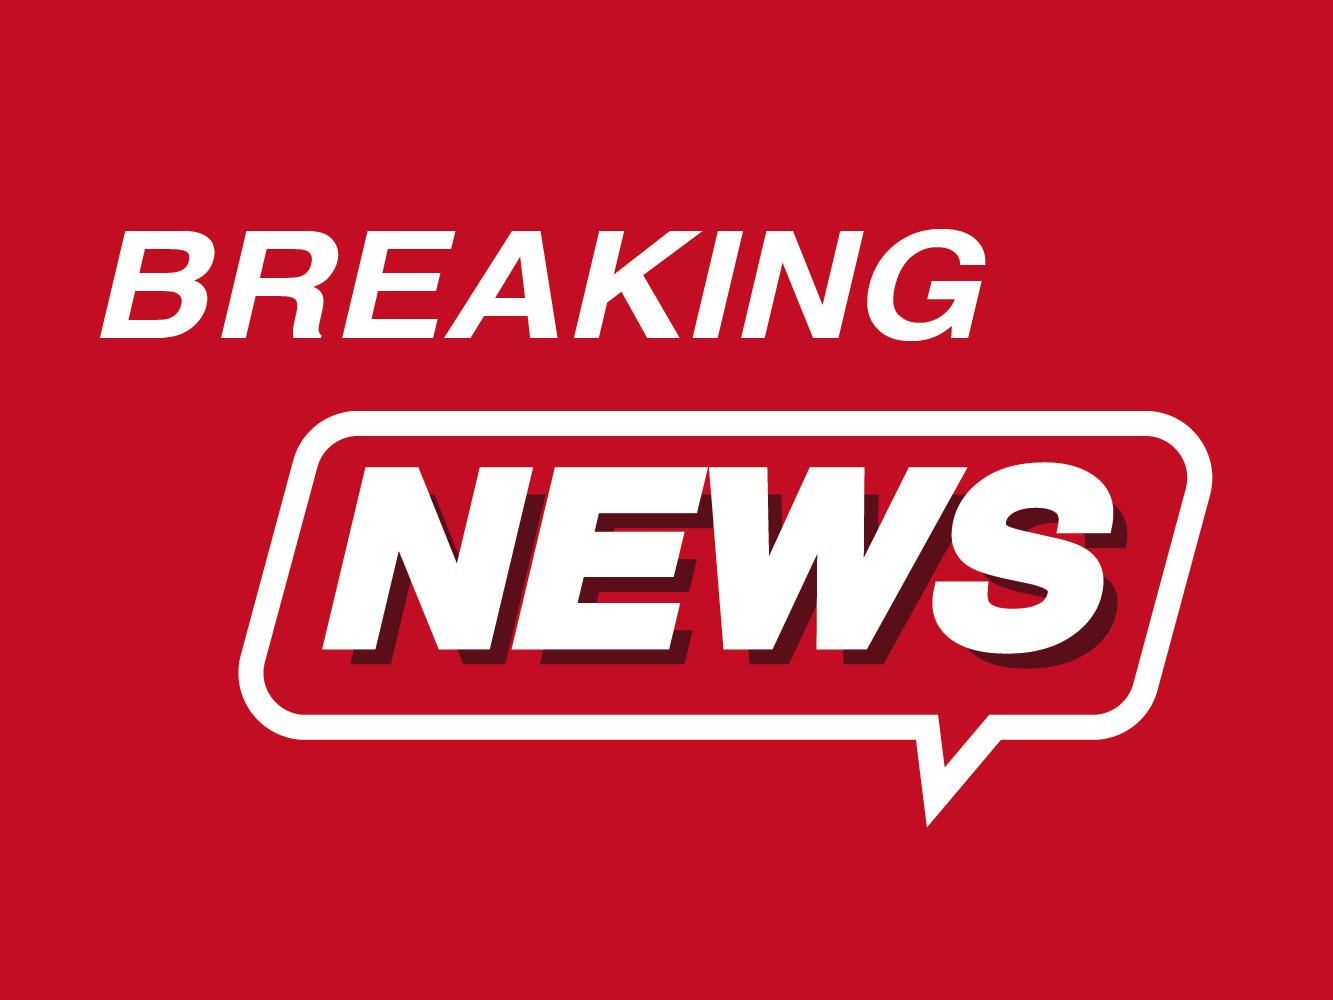 5.1-magnitude quake hits Xinjiang, no casualties reported